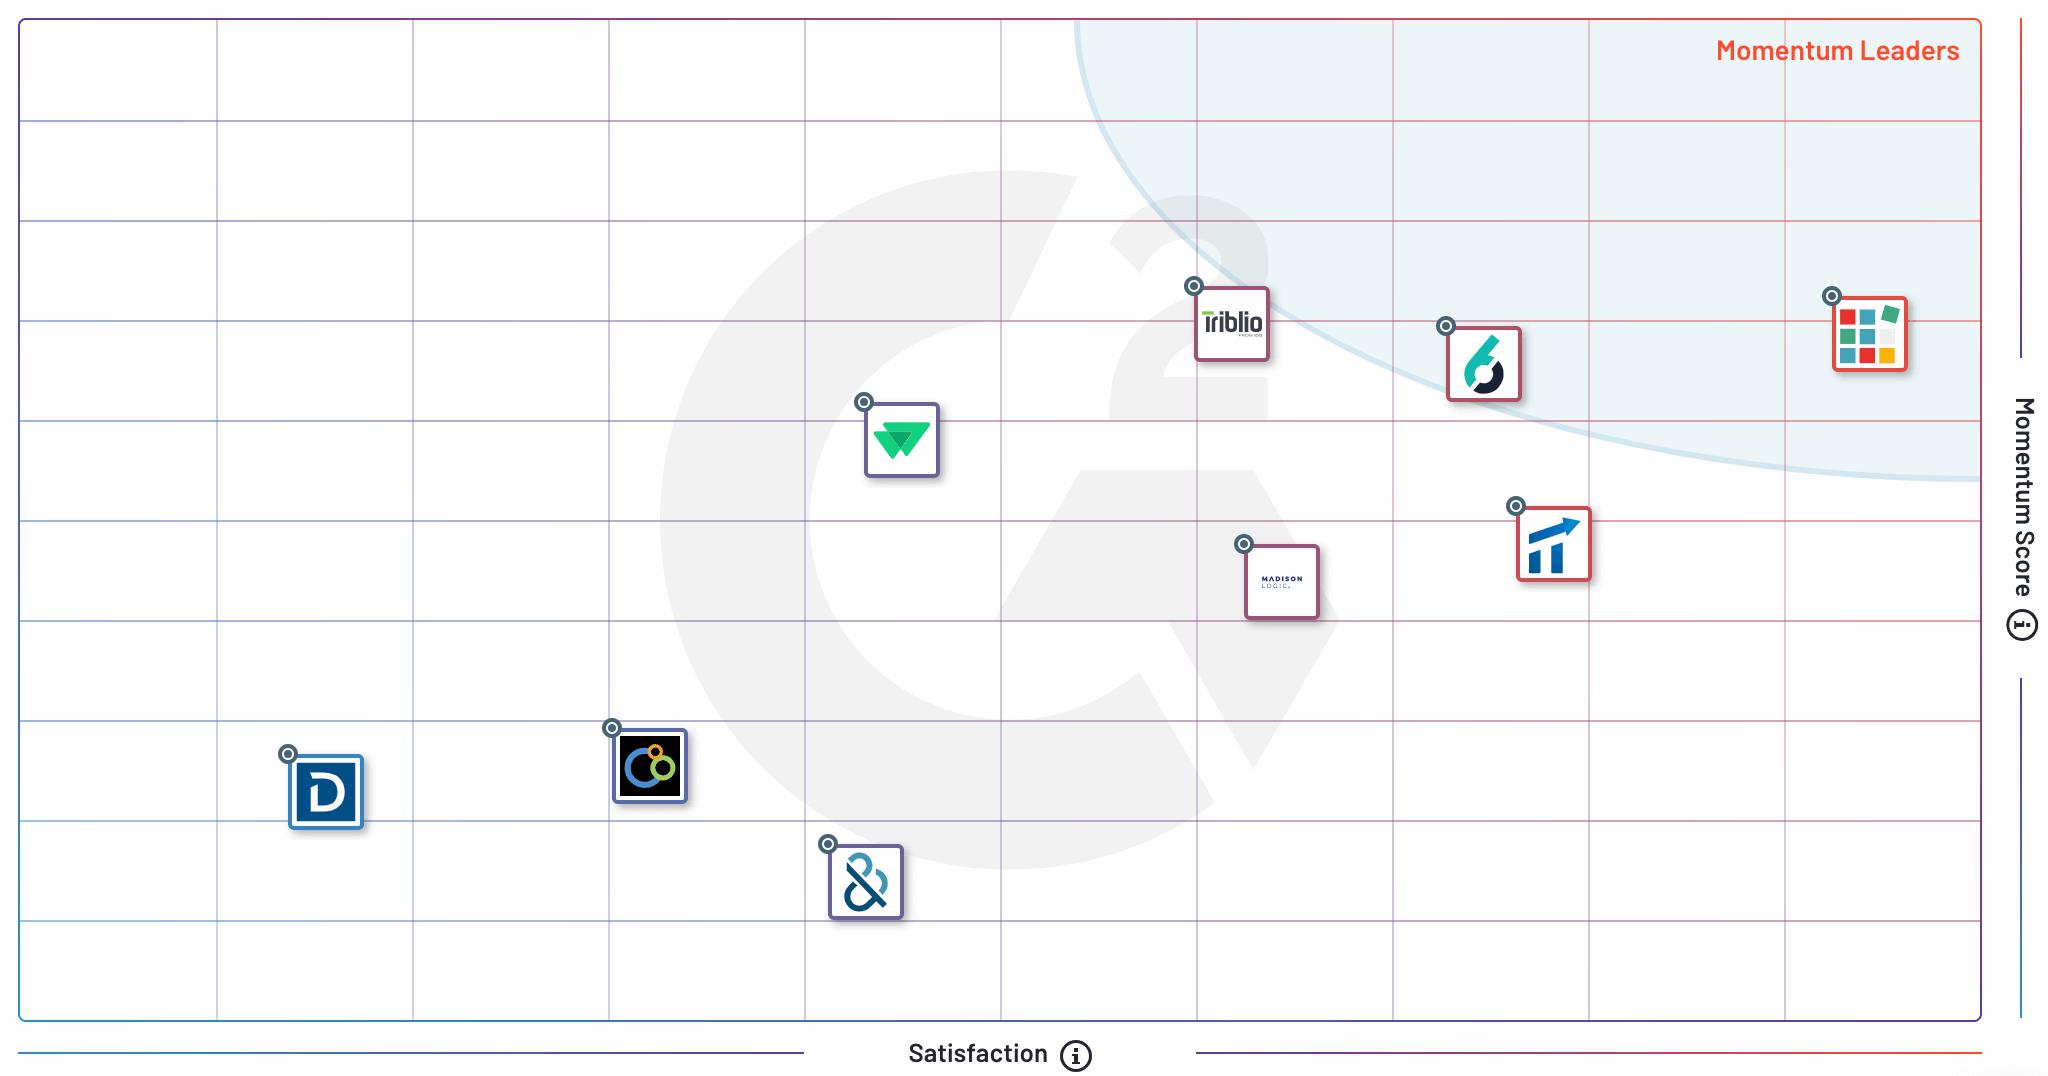 G2 Winter 2021 - Account-Based Advertising Momentum Grid